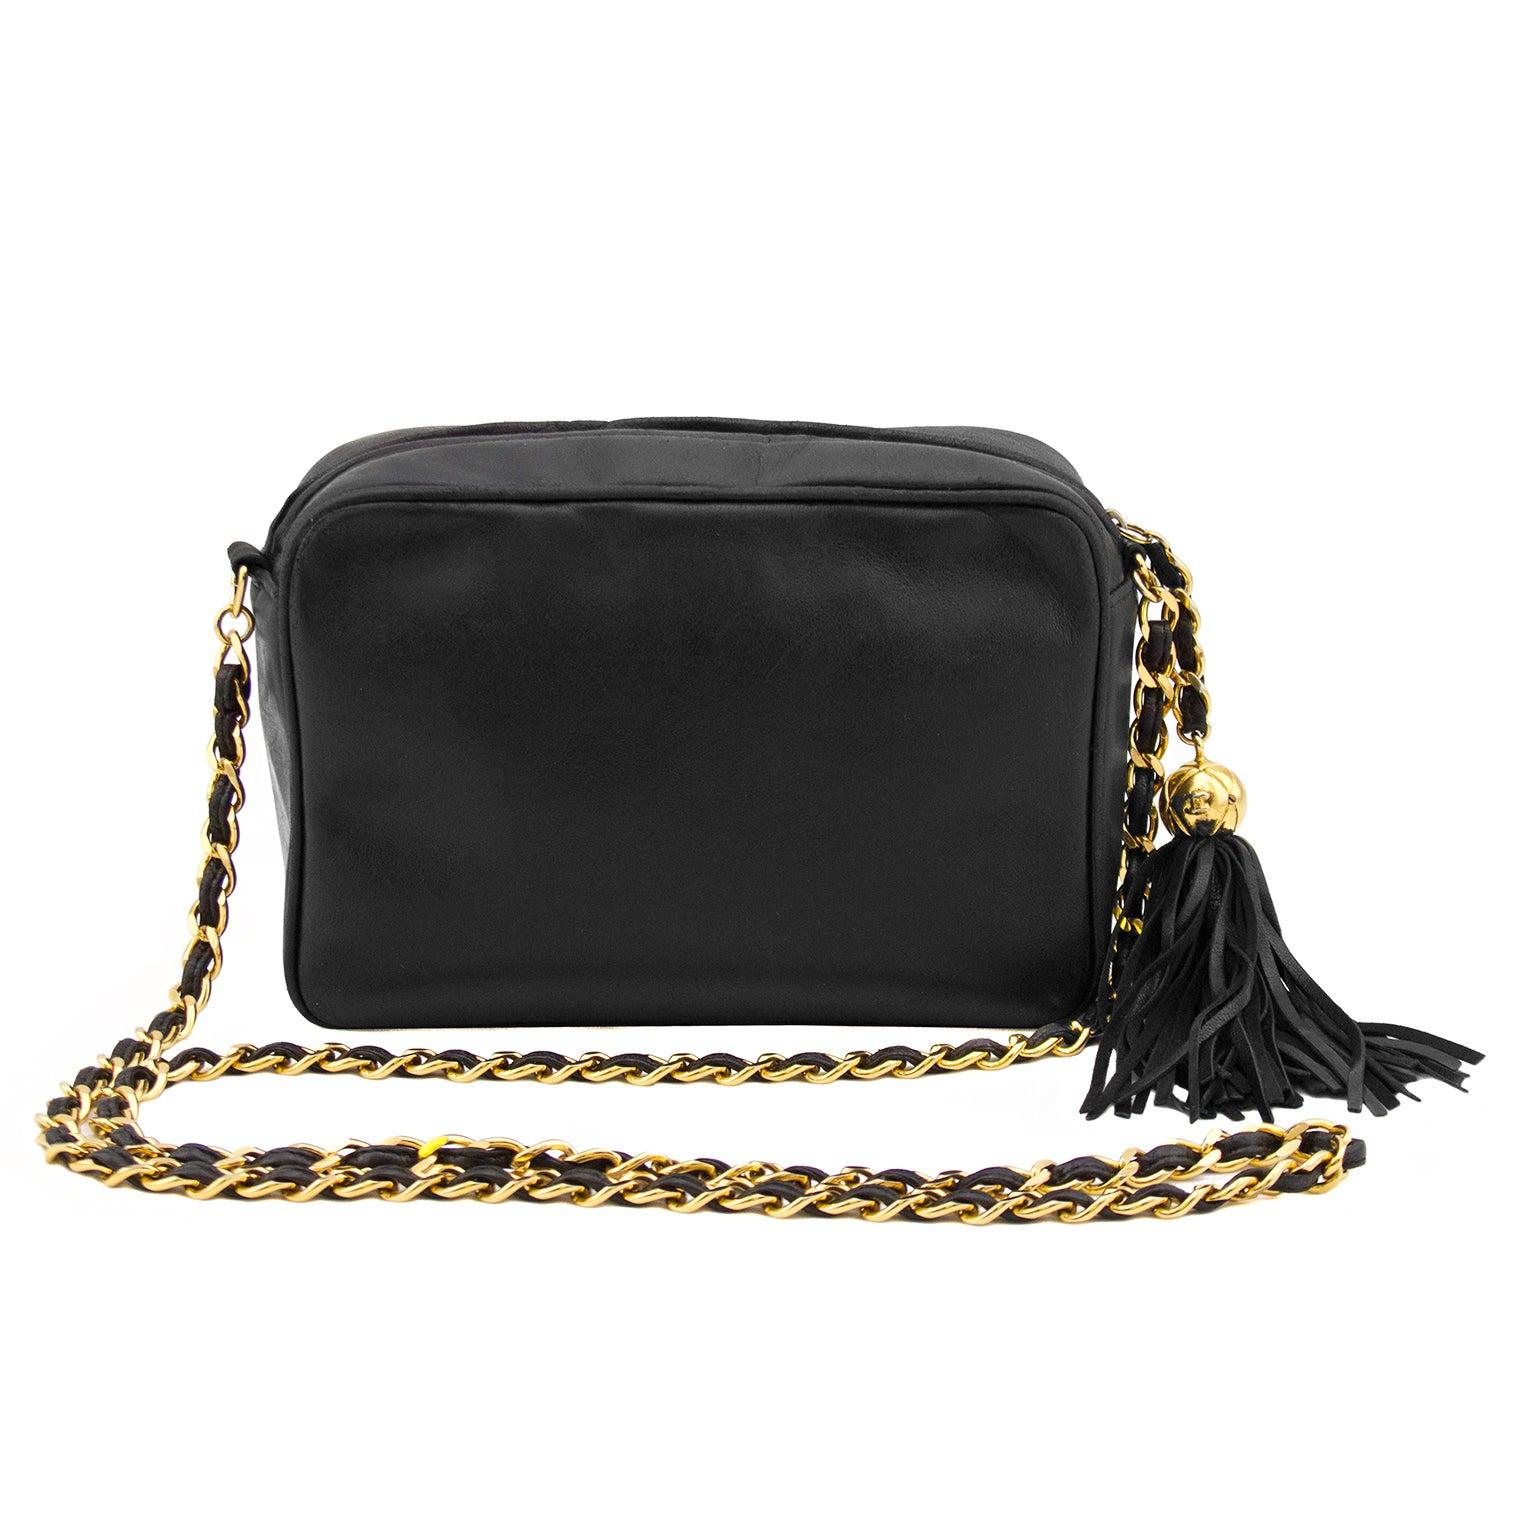 c6d5e164199a8c Chanel Black Lambskin Leather Triple CC Logo Camera Bag at 1stdibs